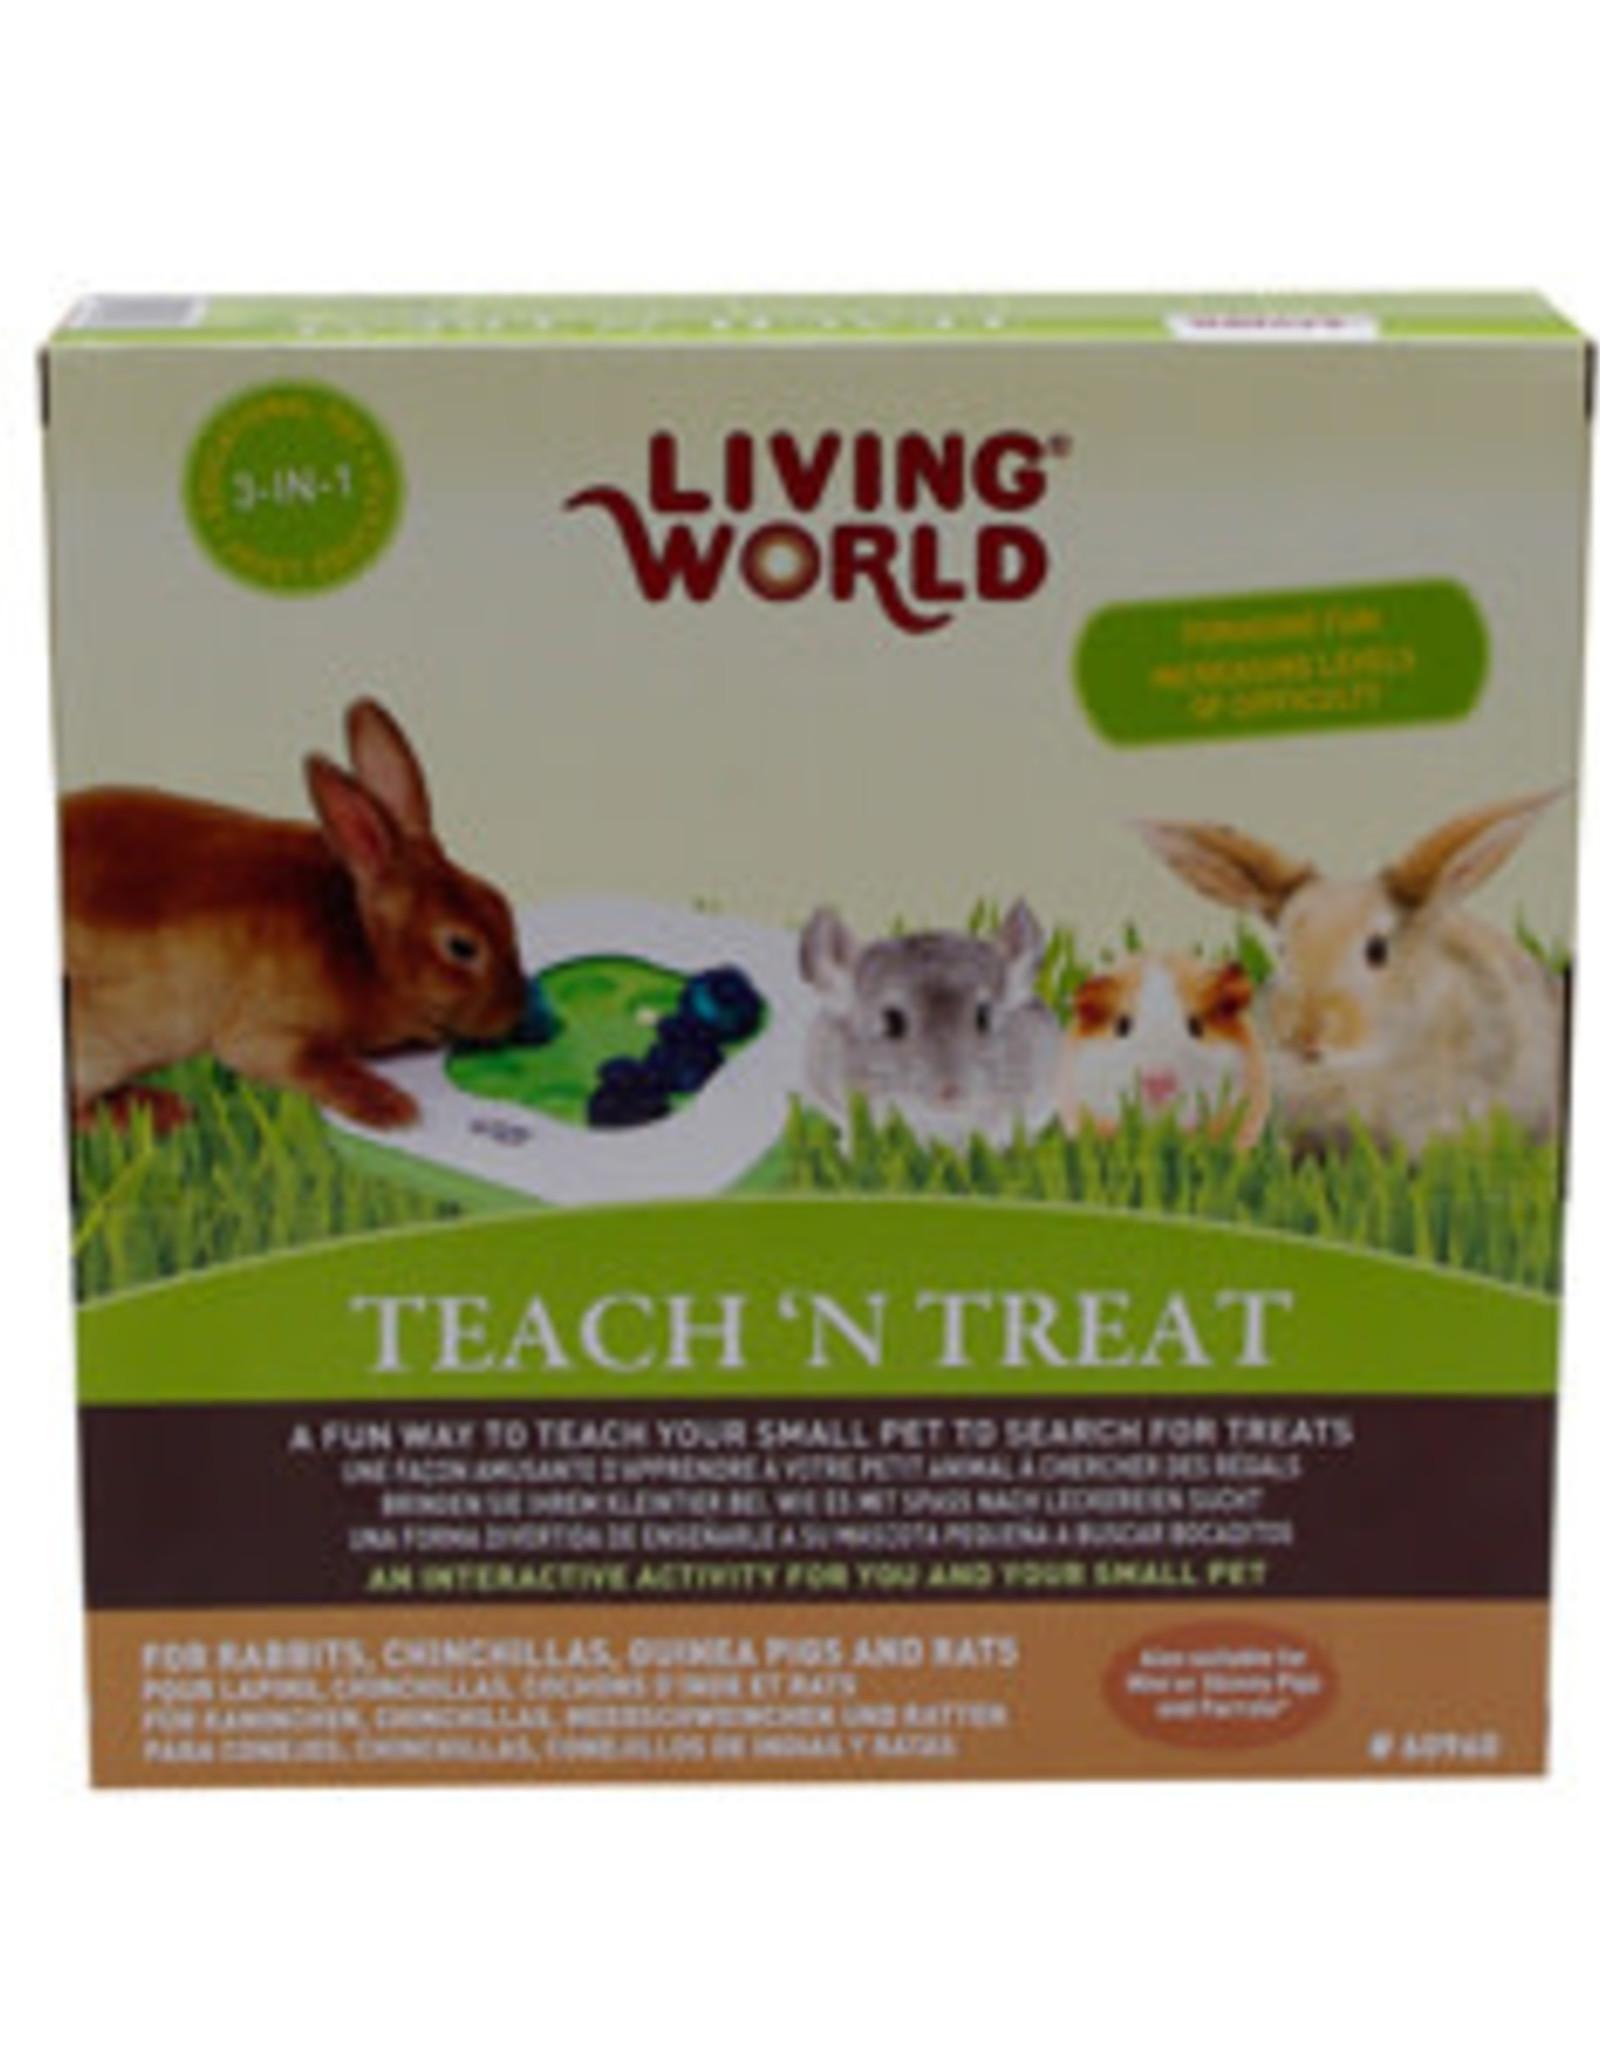 Living World Teach N Treat Toy